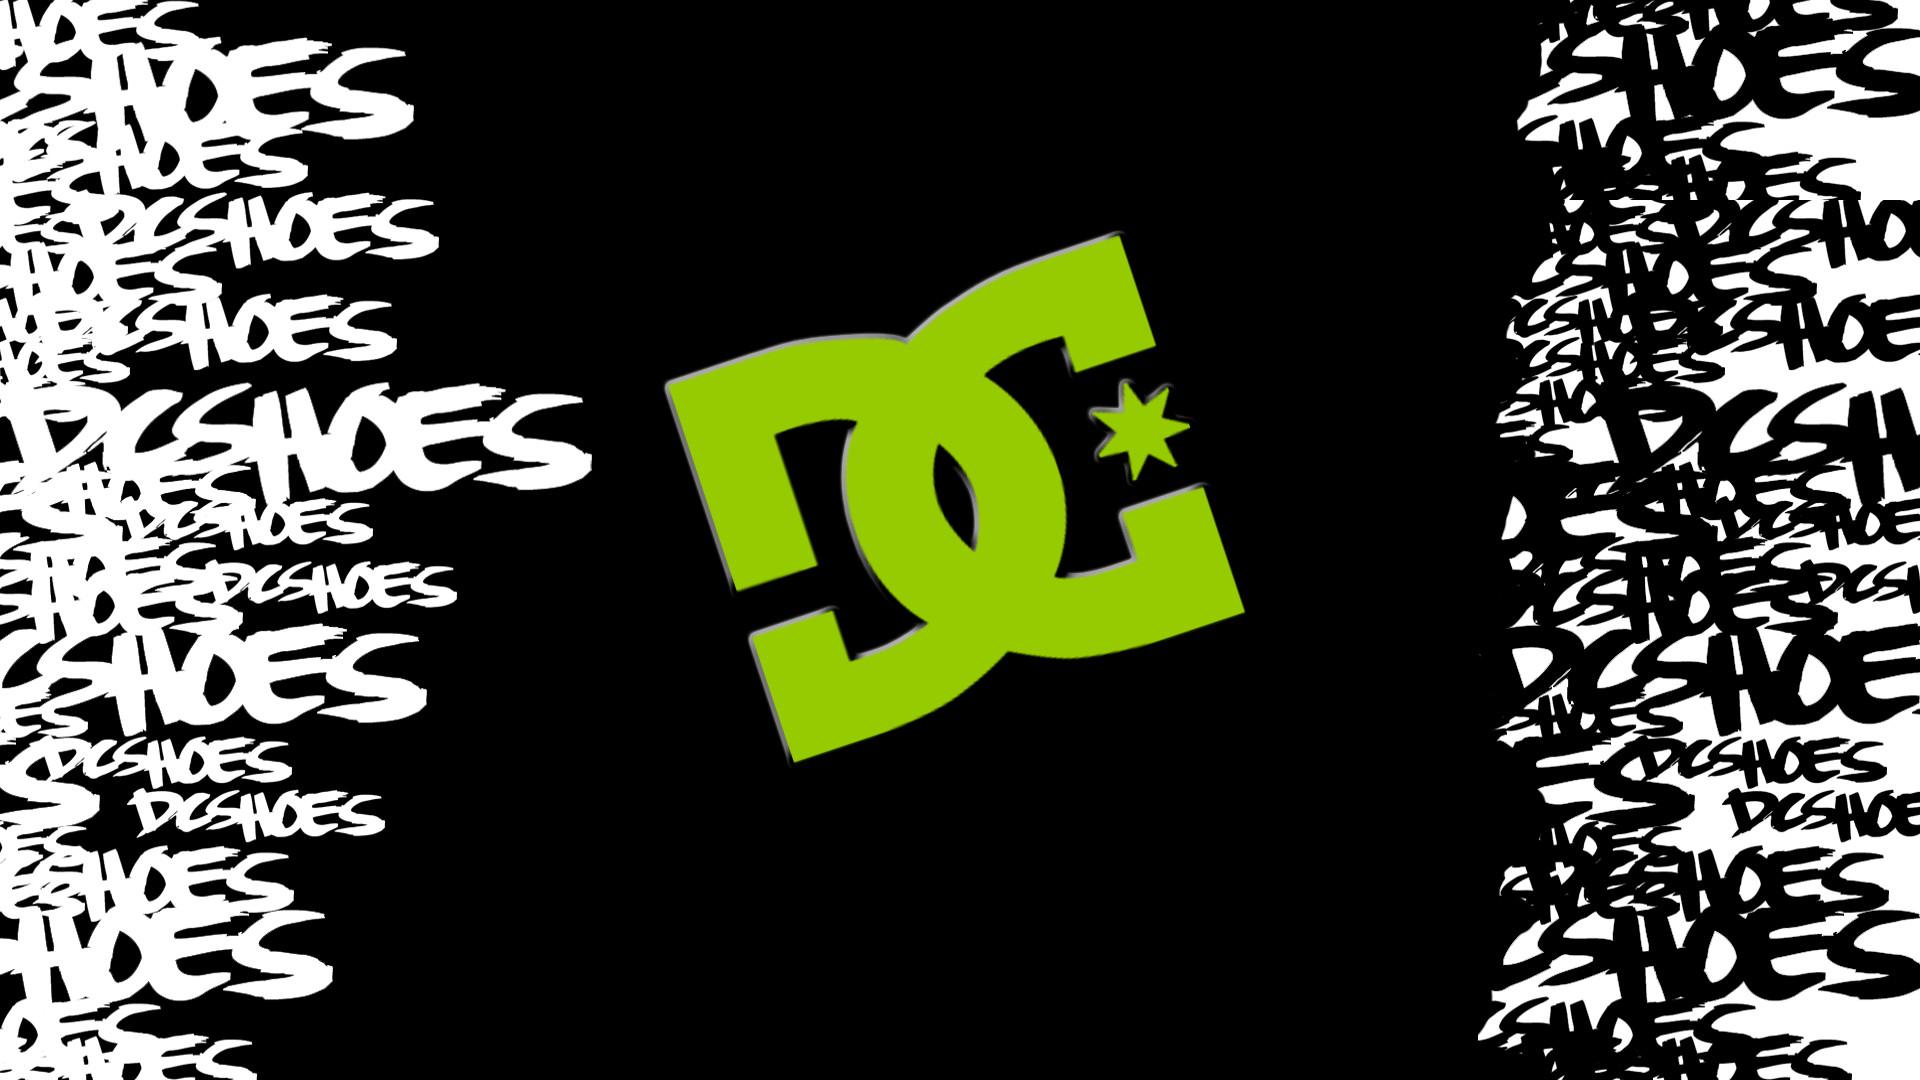 Amazing Monster Energy And Fox Racing Logo Wallpaper Comiccabalcom